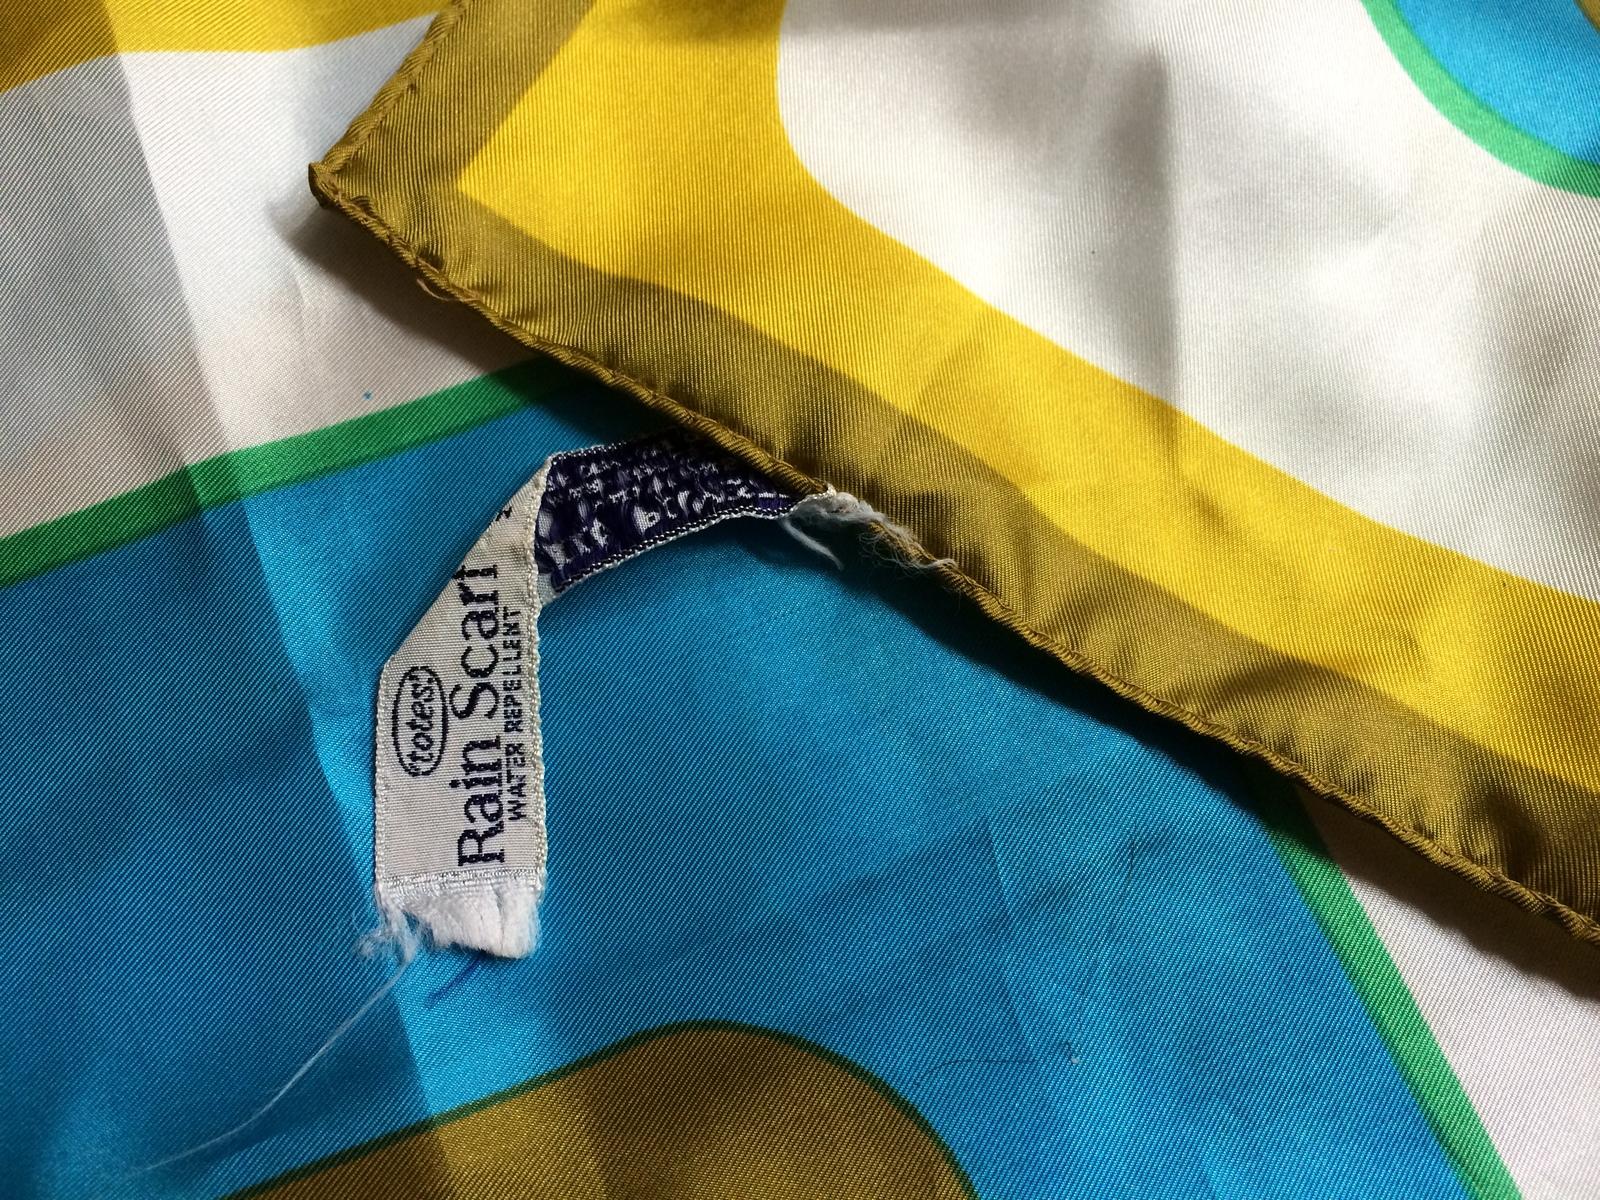 Totes Rain Scarf Water Repellent Yellow Gold Green Blue White Retro True Vintage